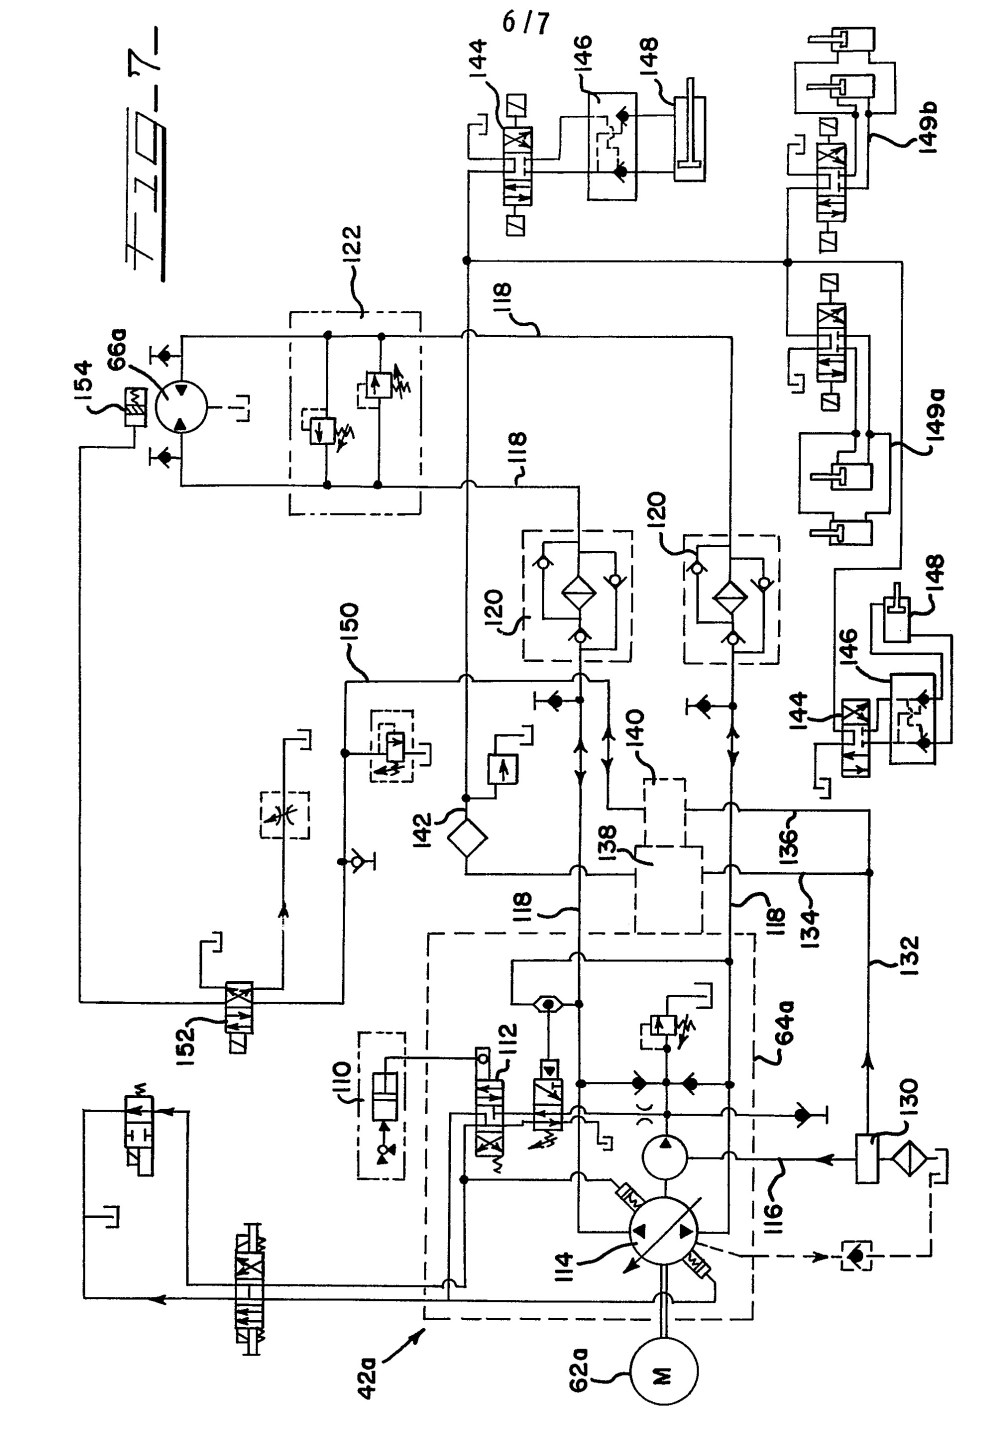 medium resolution of estate dryer wiring diagram wiring library mix whirlpool refrigerator wiring diagr whirlpool estate dryer wiring diagram